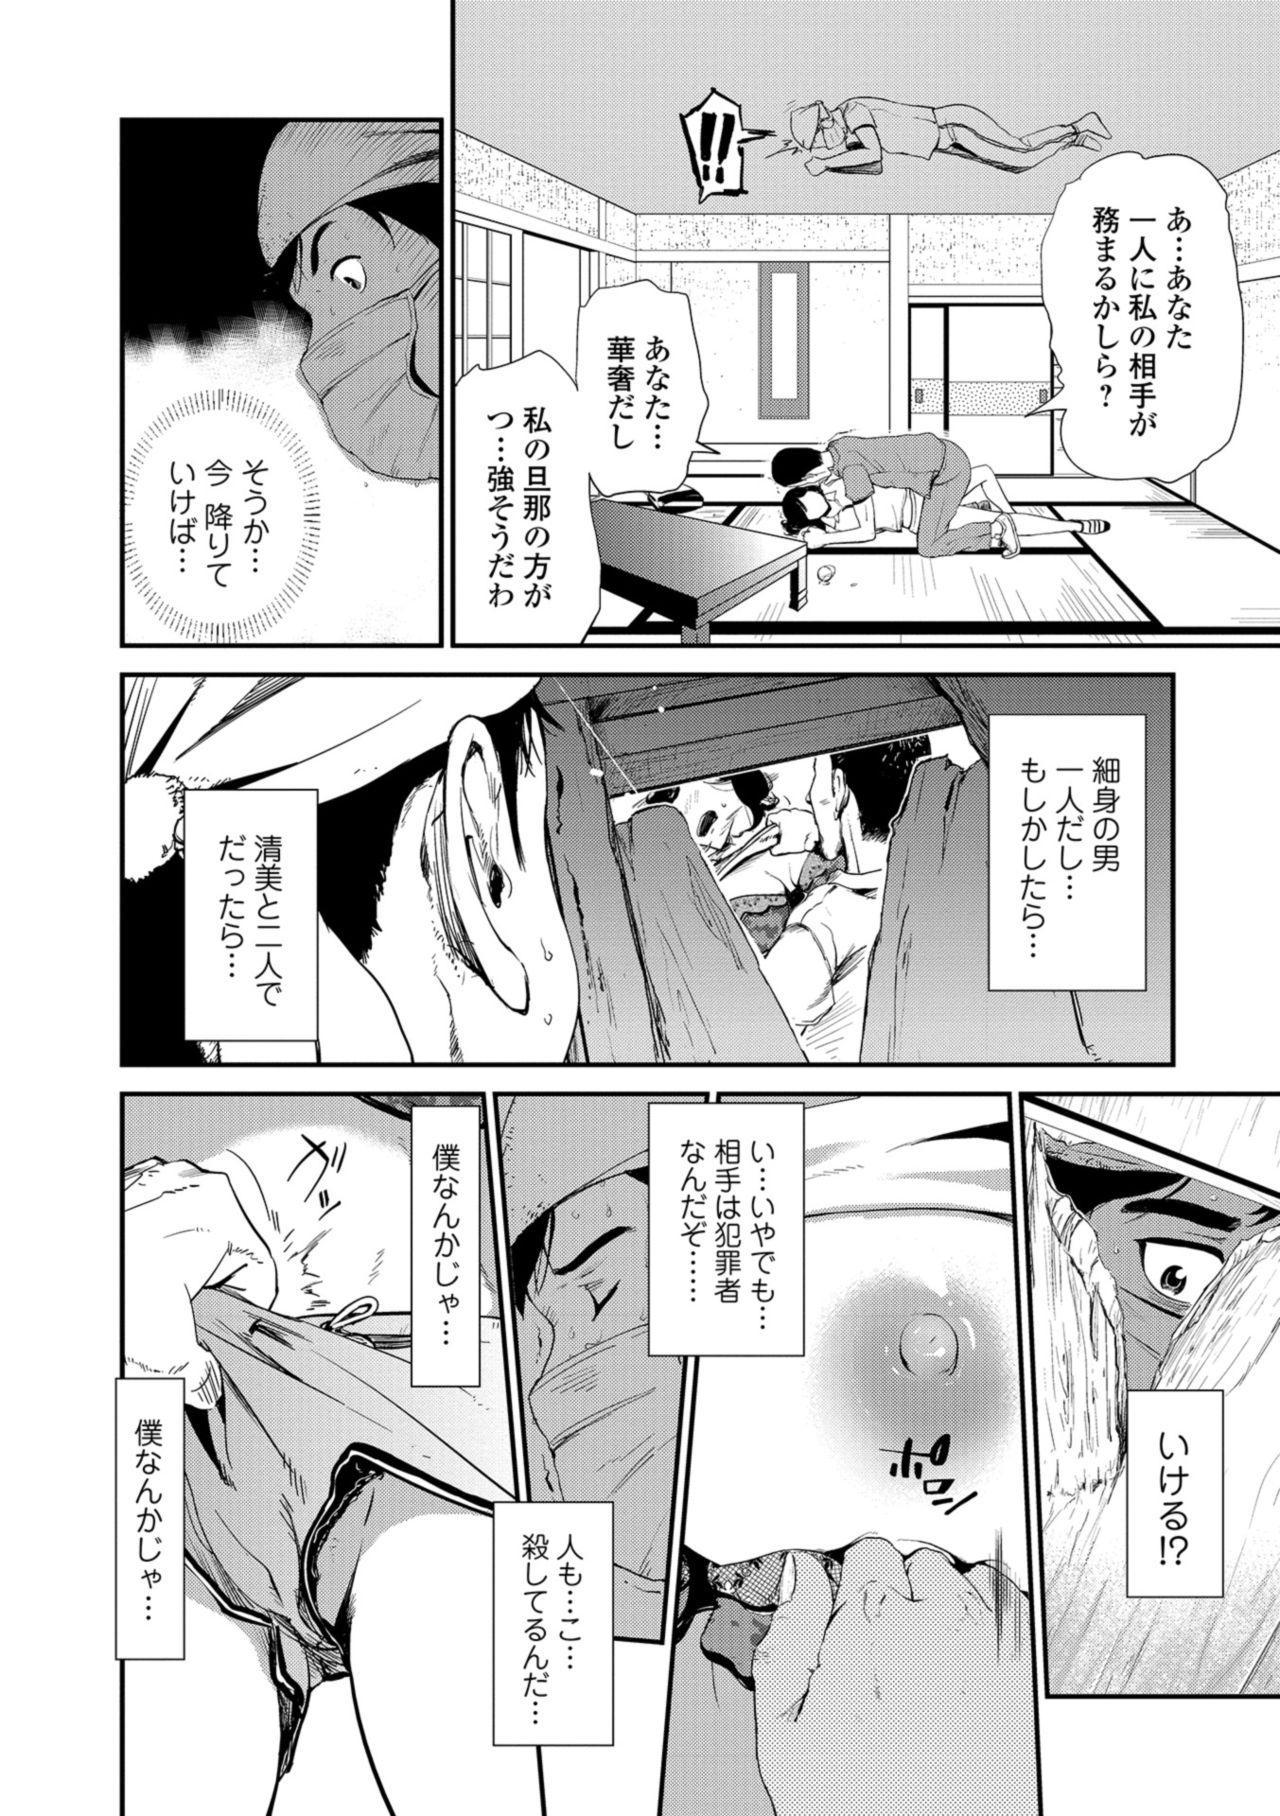 COMIC Shigekiteki SQUIRT!! Vol. 09 167